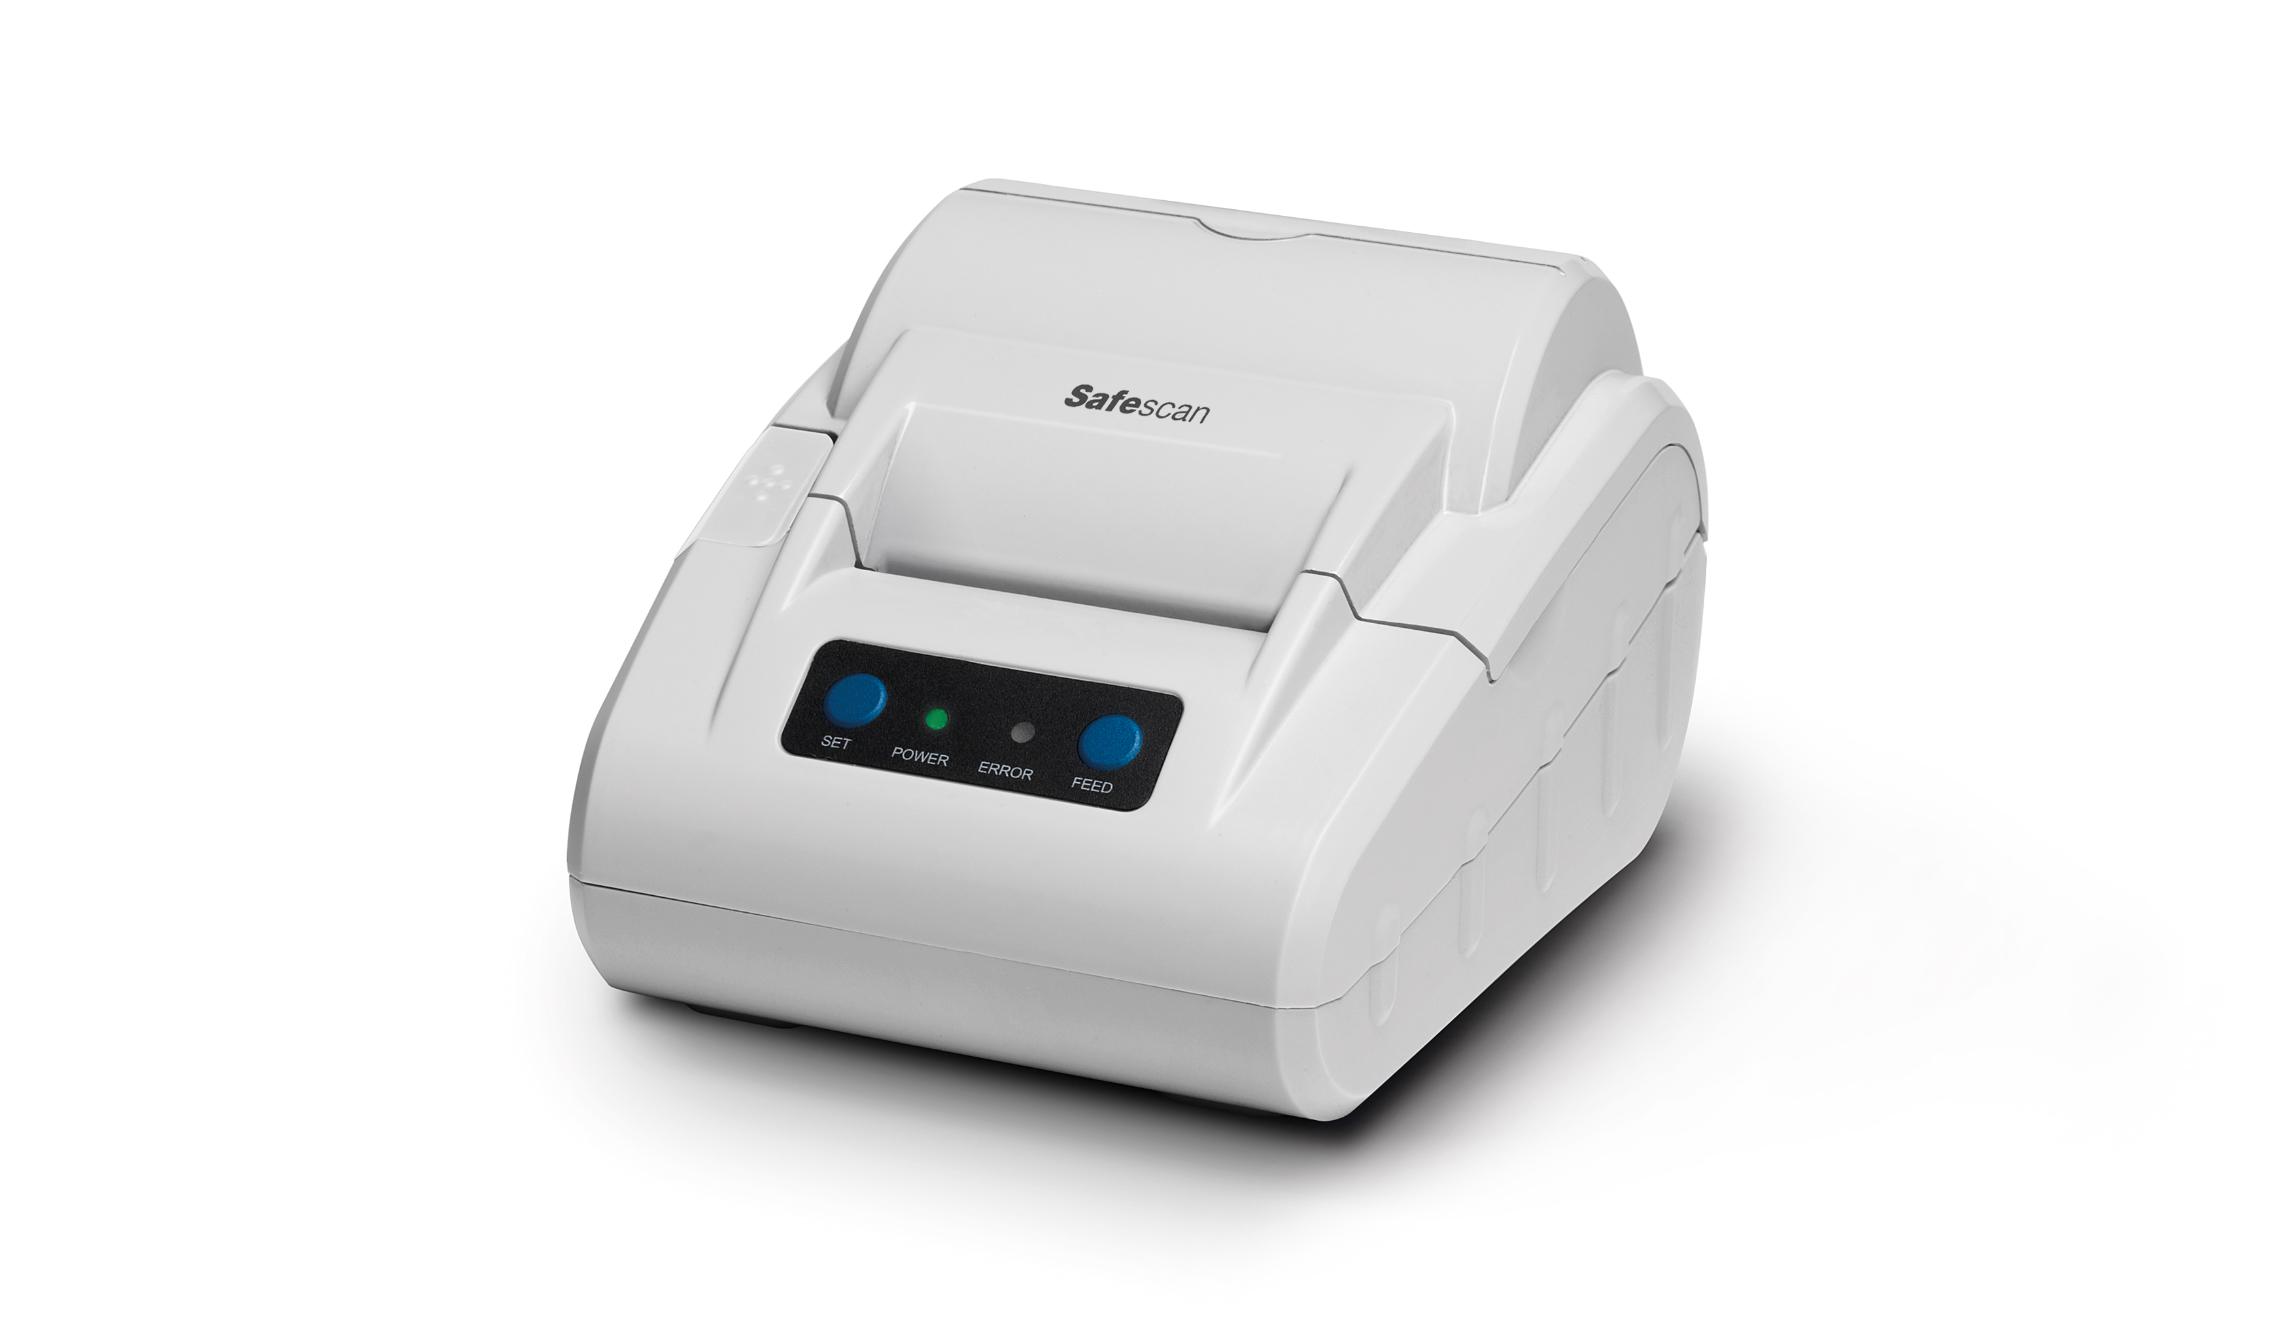 Safescan TP-230 Grey Thermal Printer